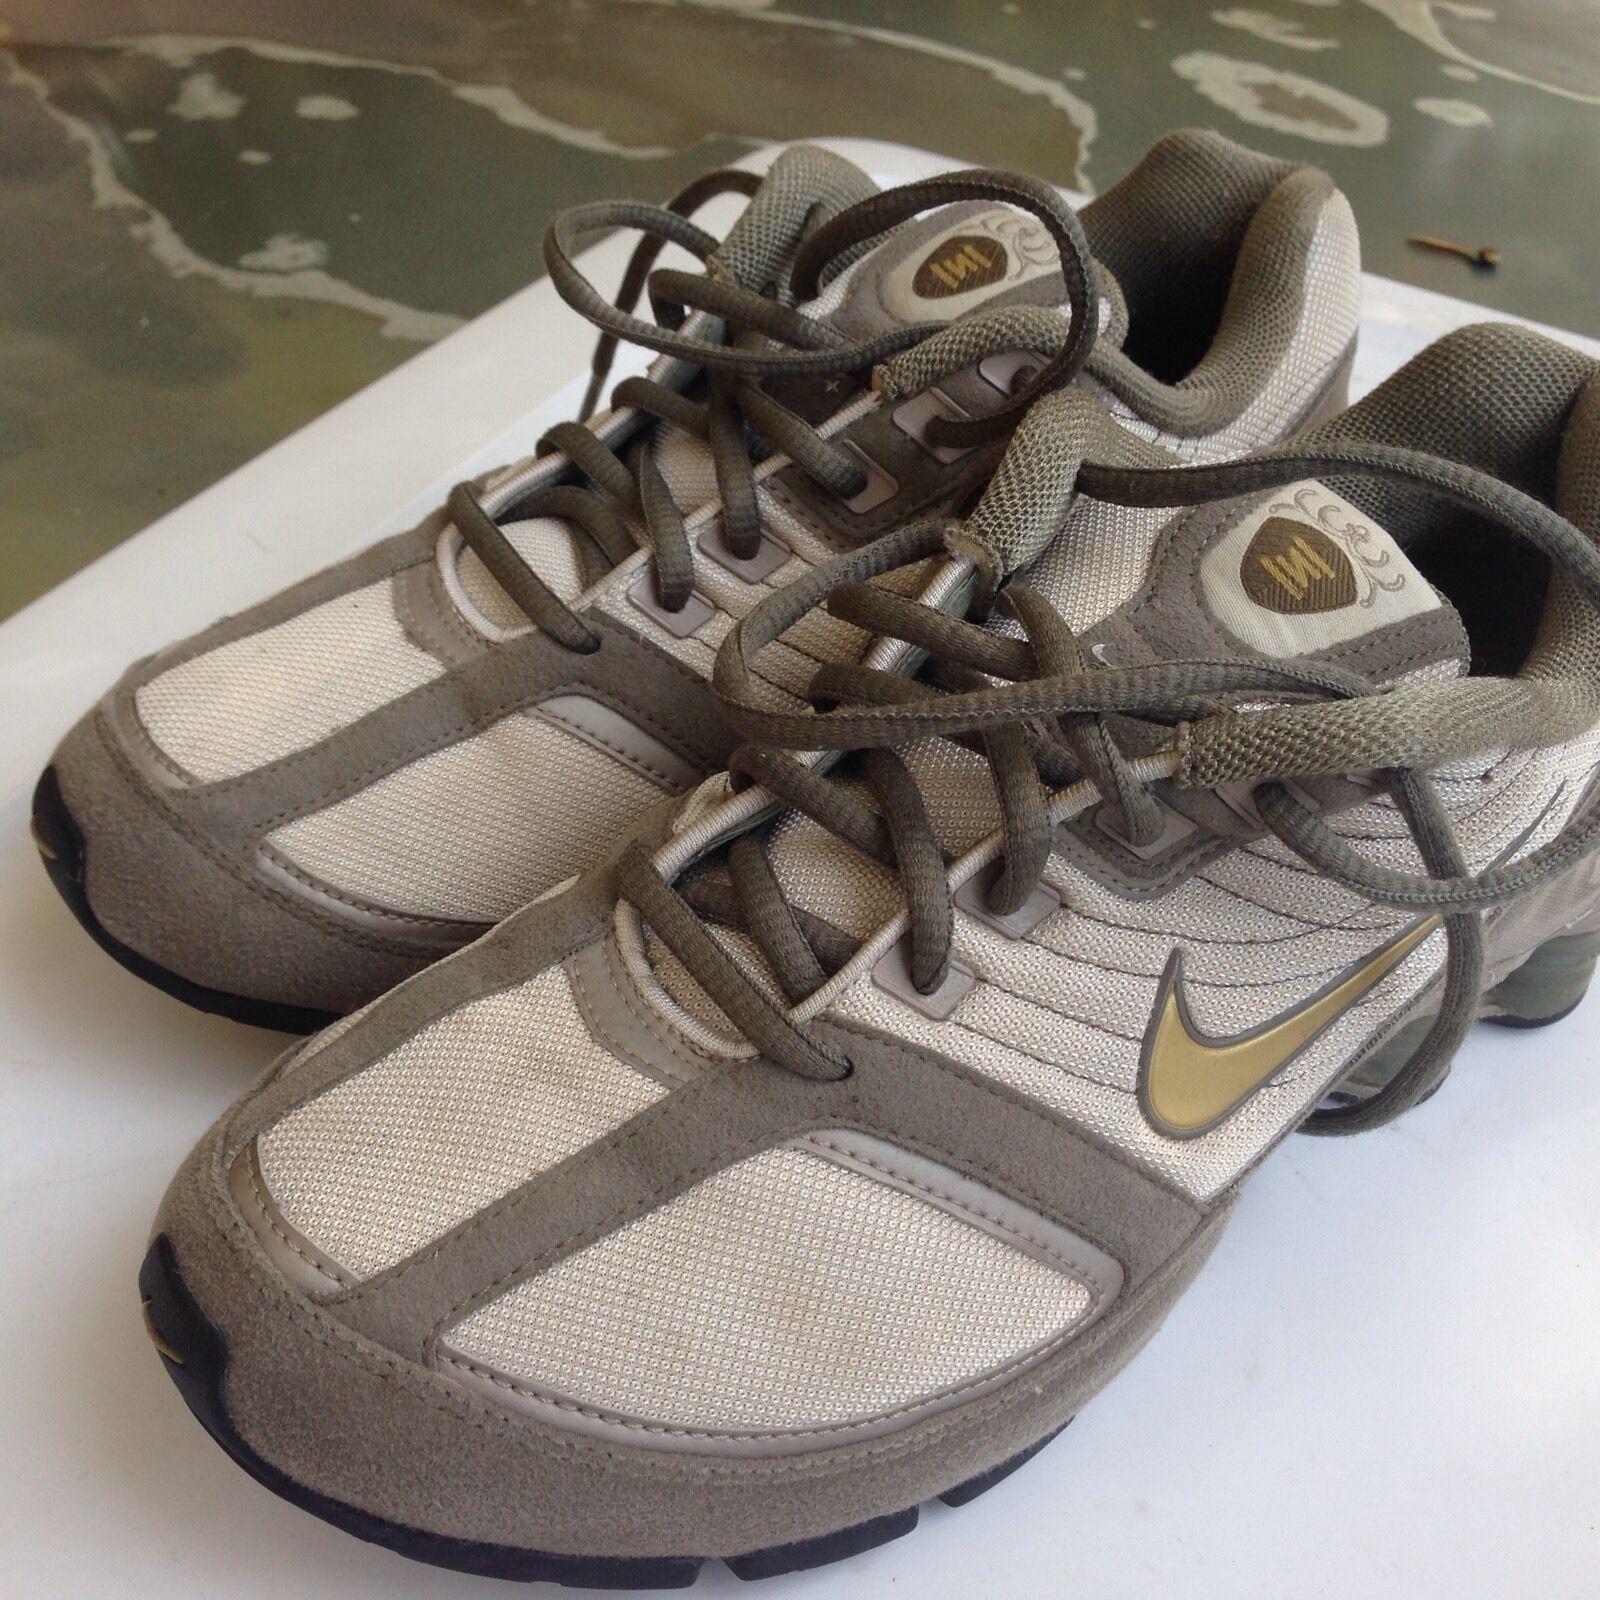 buy online e8efd 84274 ... Nike Zoom Zoom Zoom Vomero + 8 Donna Scarpe da Ginnastica Corsa 580593  630 Tennis 4089df ...